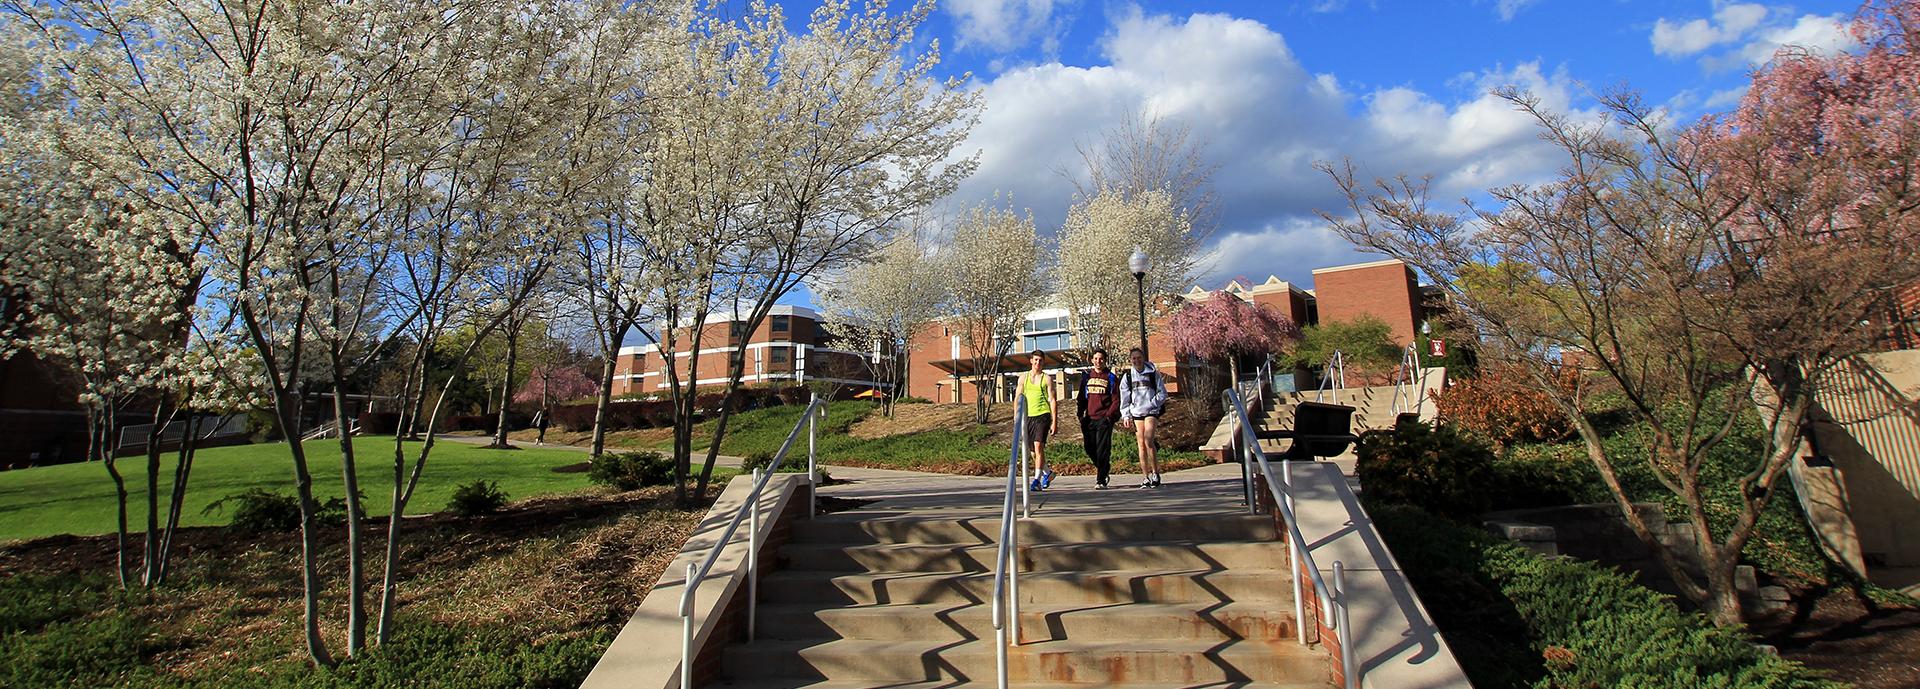 Warren Student Services Building